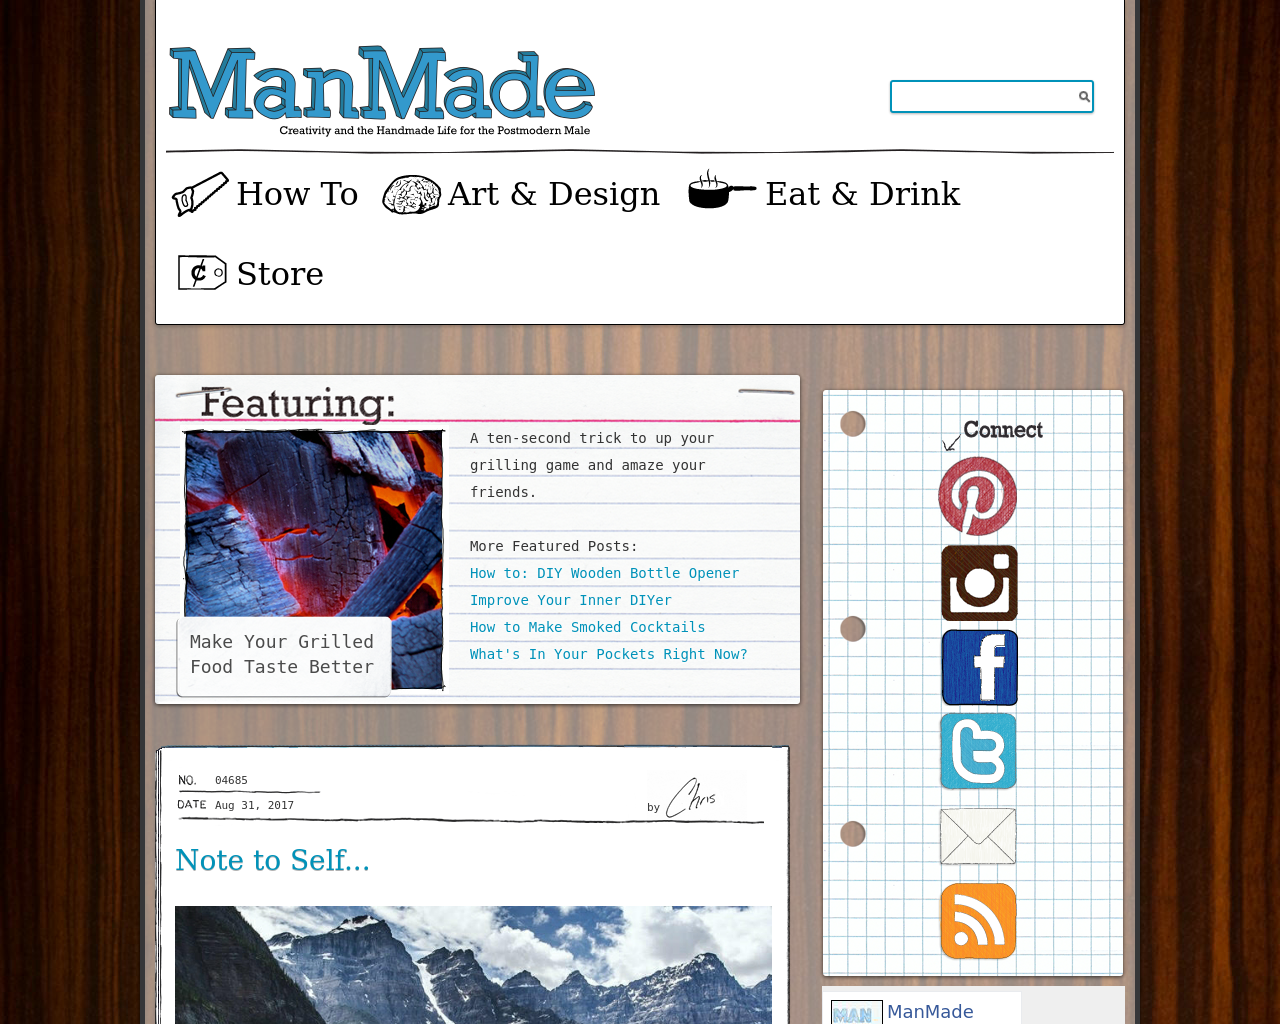 Man-Made-DIY-Advertising-Reviews-Pricing